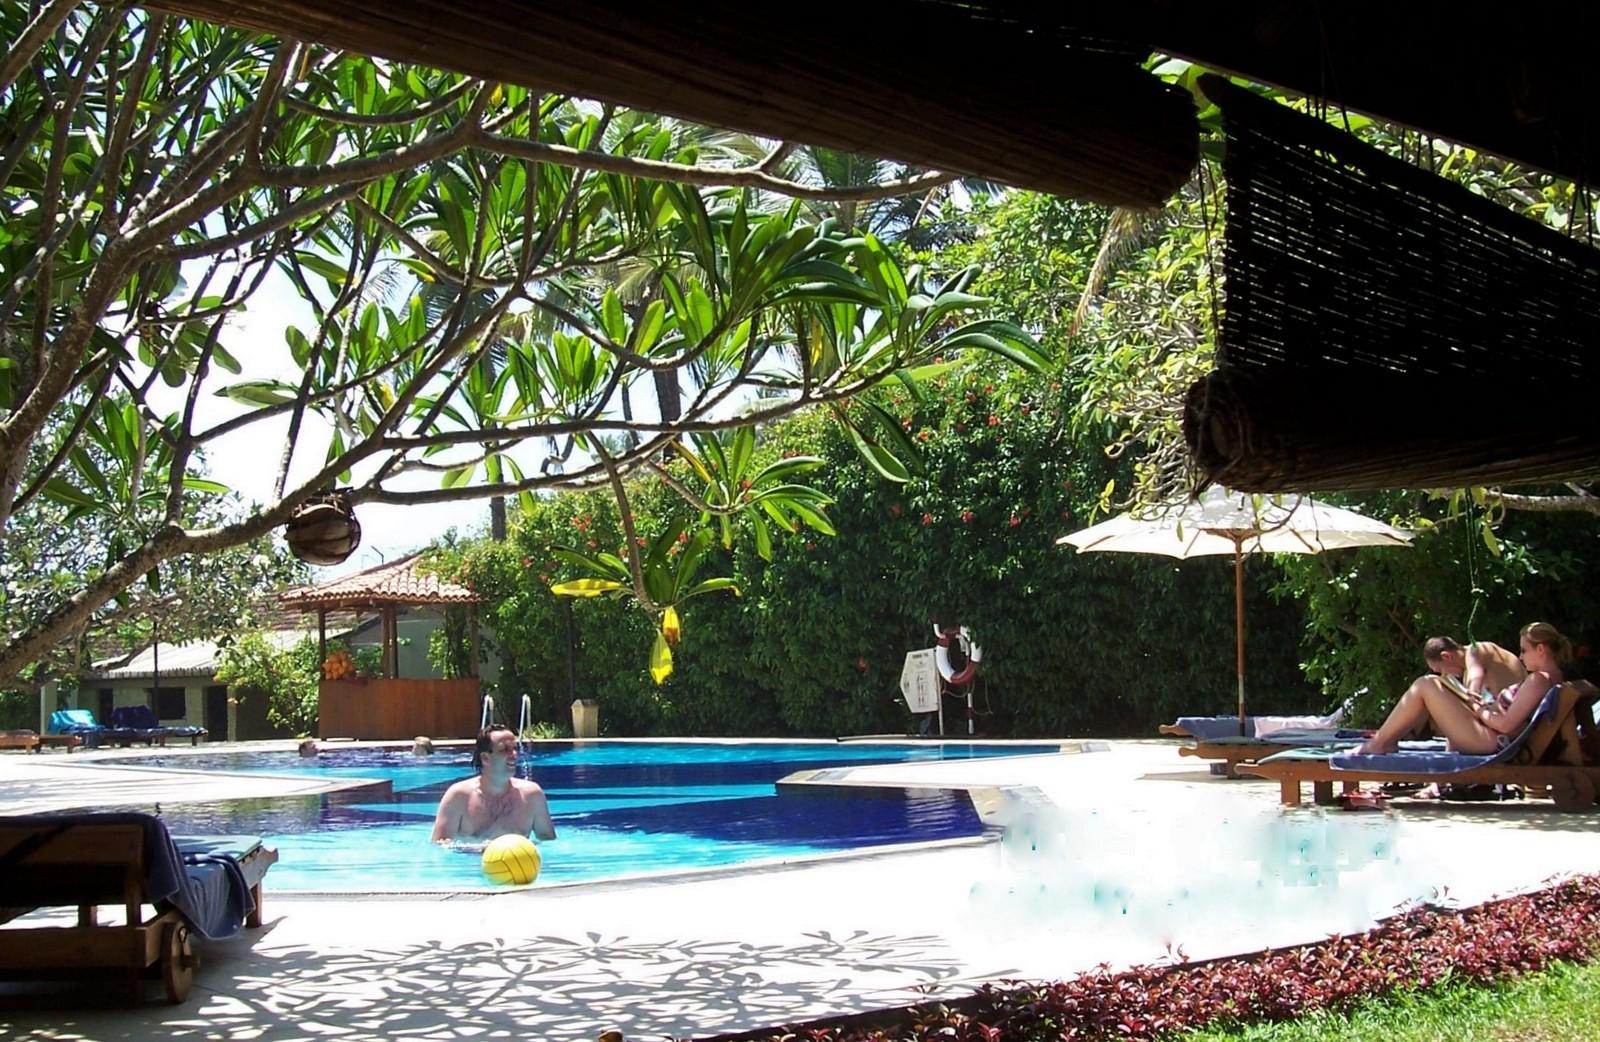 Hibiscus Beach Hotel - Kalutara - Ceylon